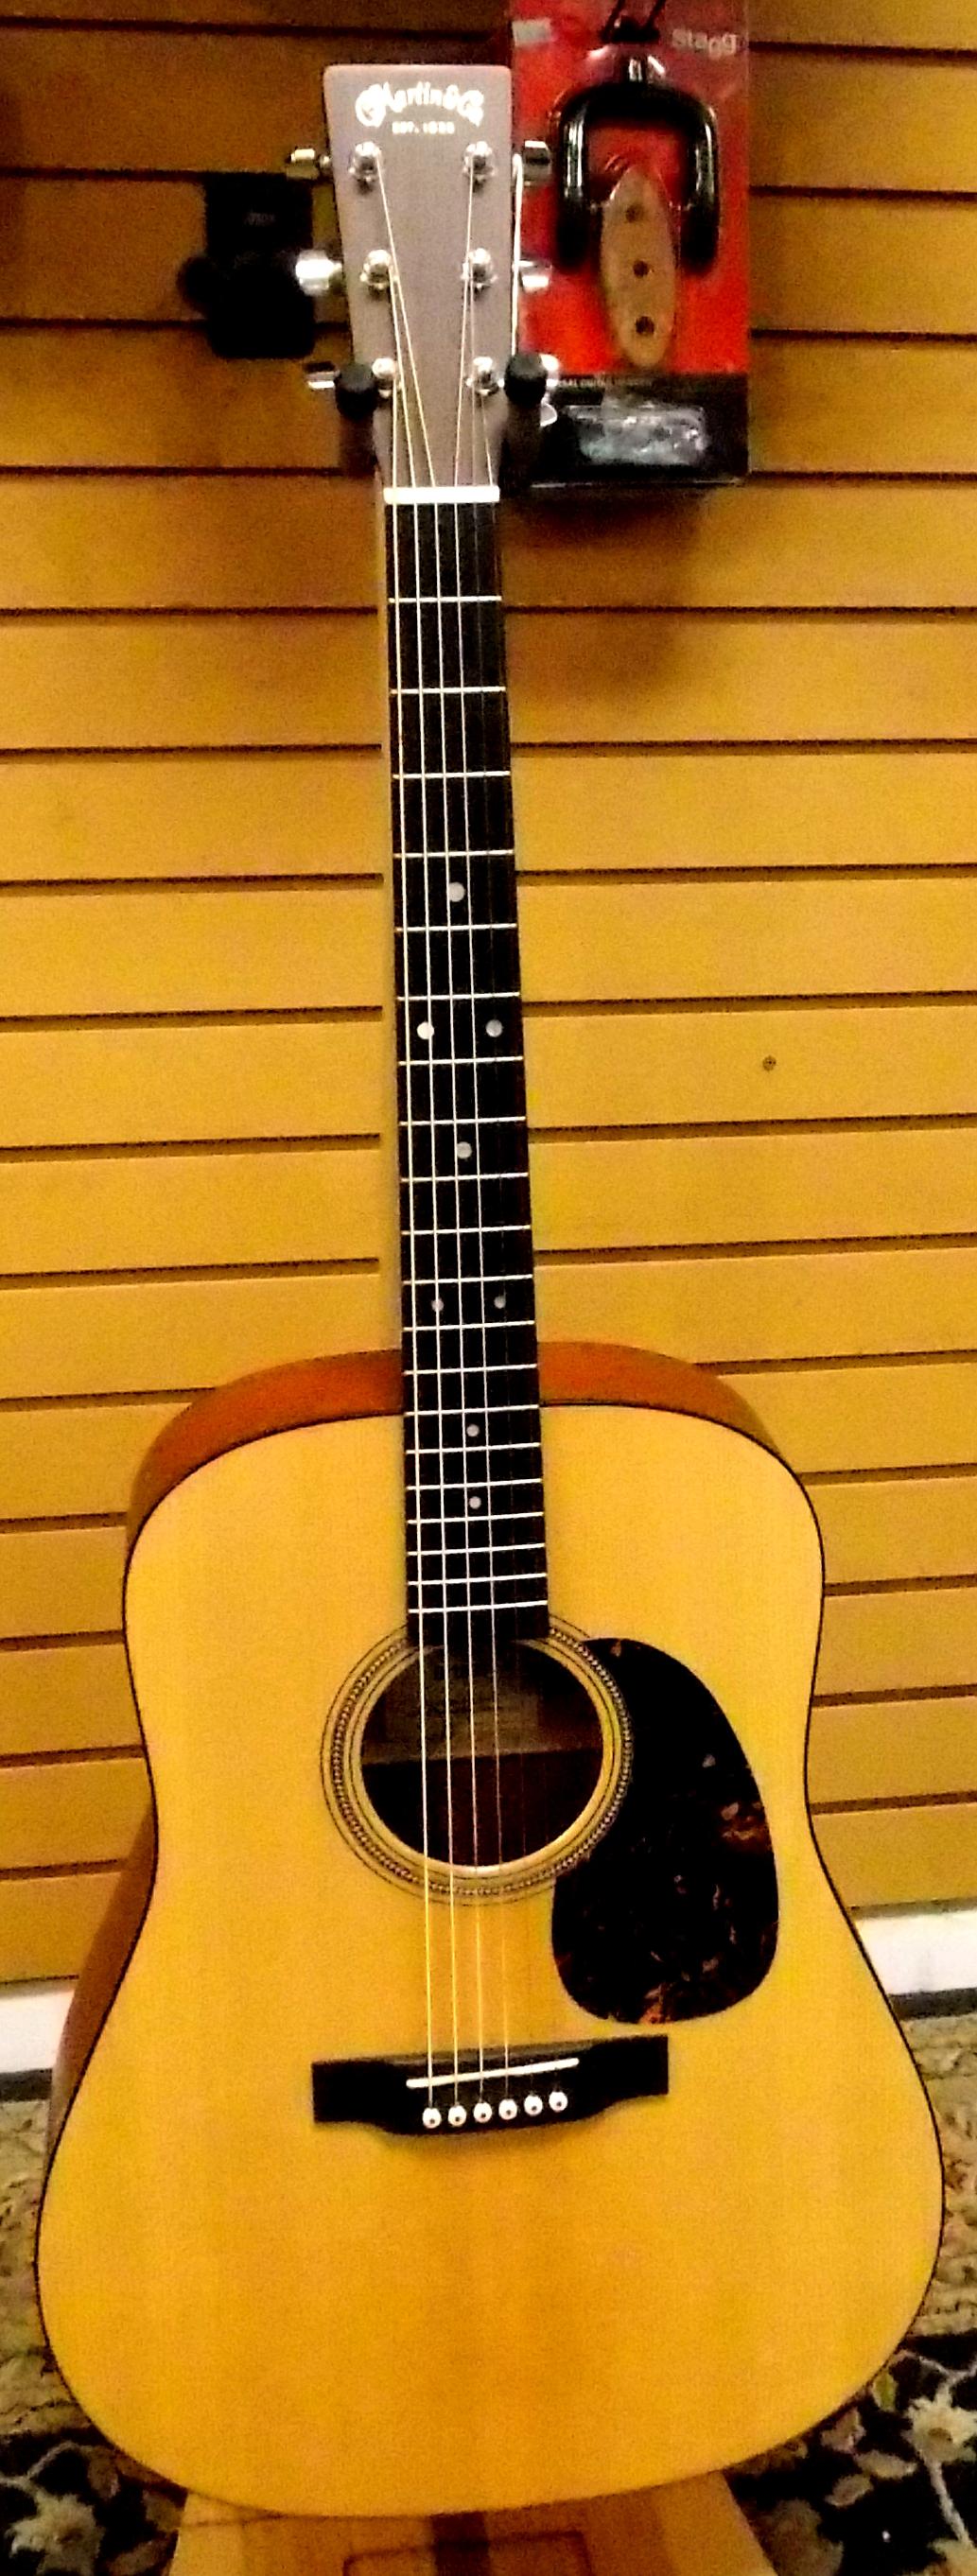 used dec 2014 006 san antonio guitar store guitar tex. Black Bedroom Furniture Sets. Home Design Ideas